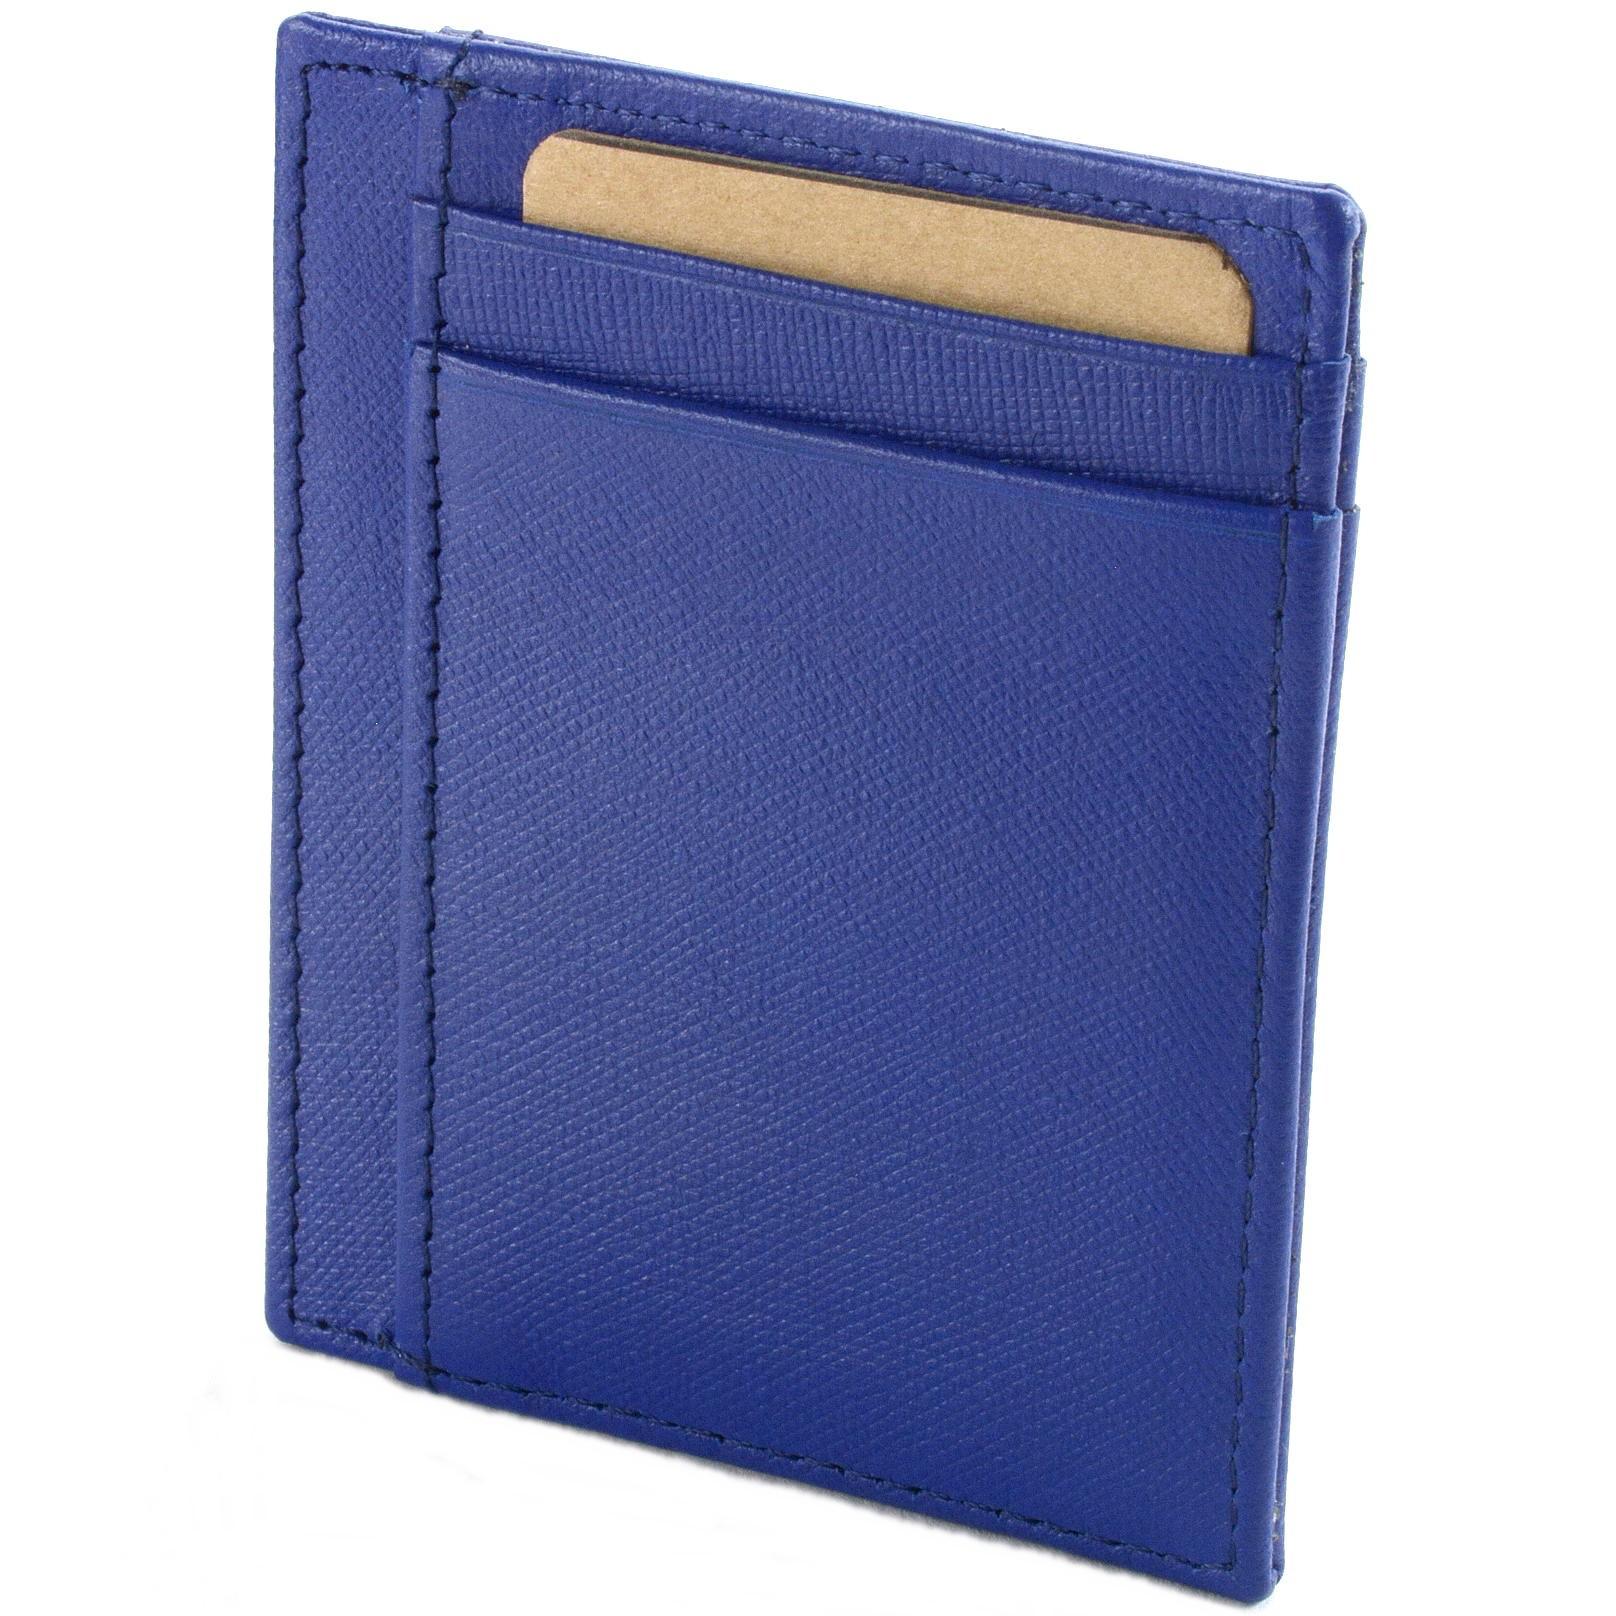 miniature 37 - Hammer-Anvil-Minimalist-Front-Pocket-Wallet-RFID-Blocking-Thin-Leather-Card-Case